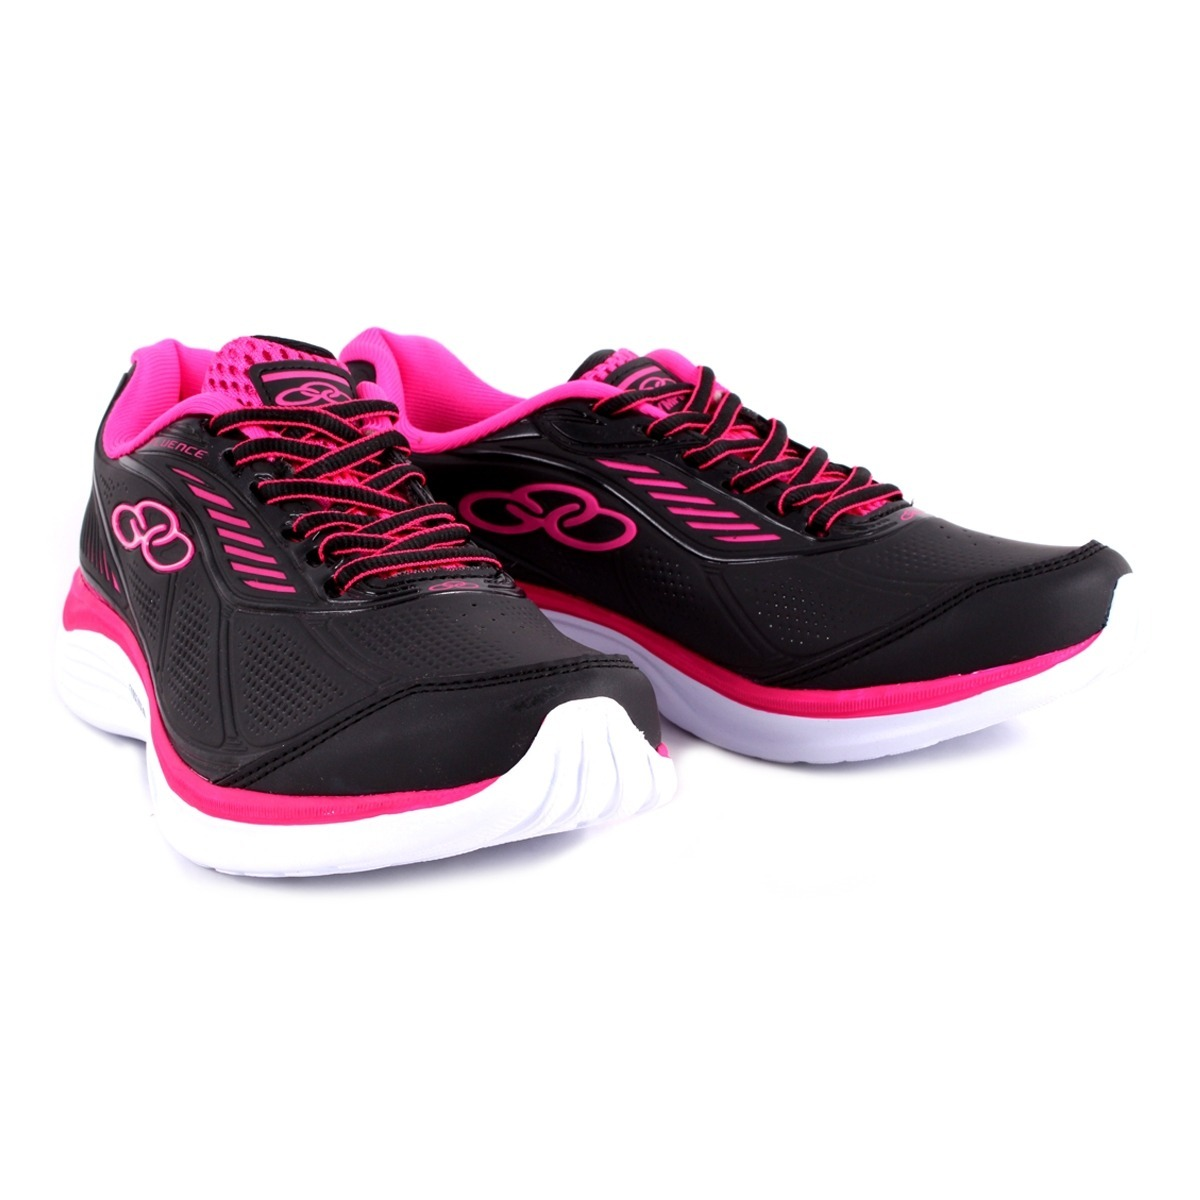 c3f804530 Tênis Feminino Olympikus Fluence ,caminhada,academia,corrida - R ...